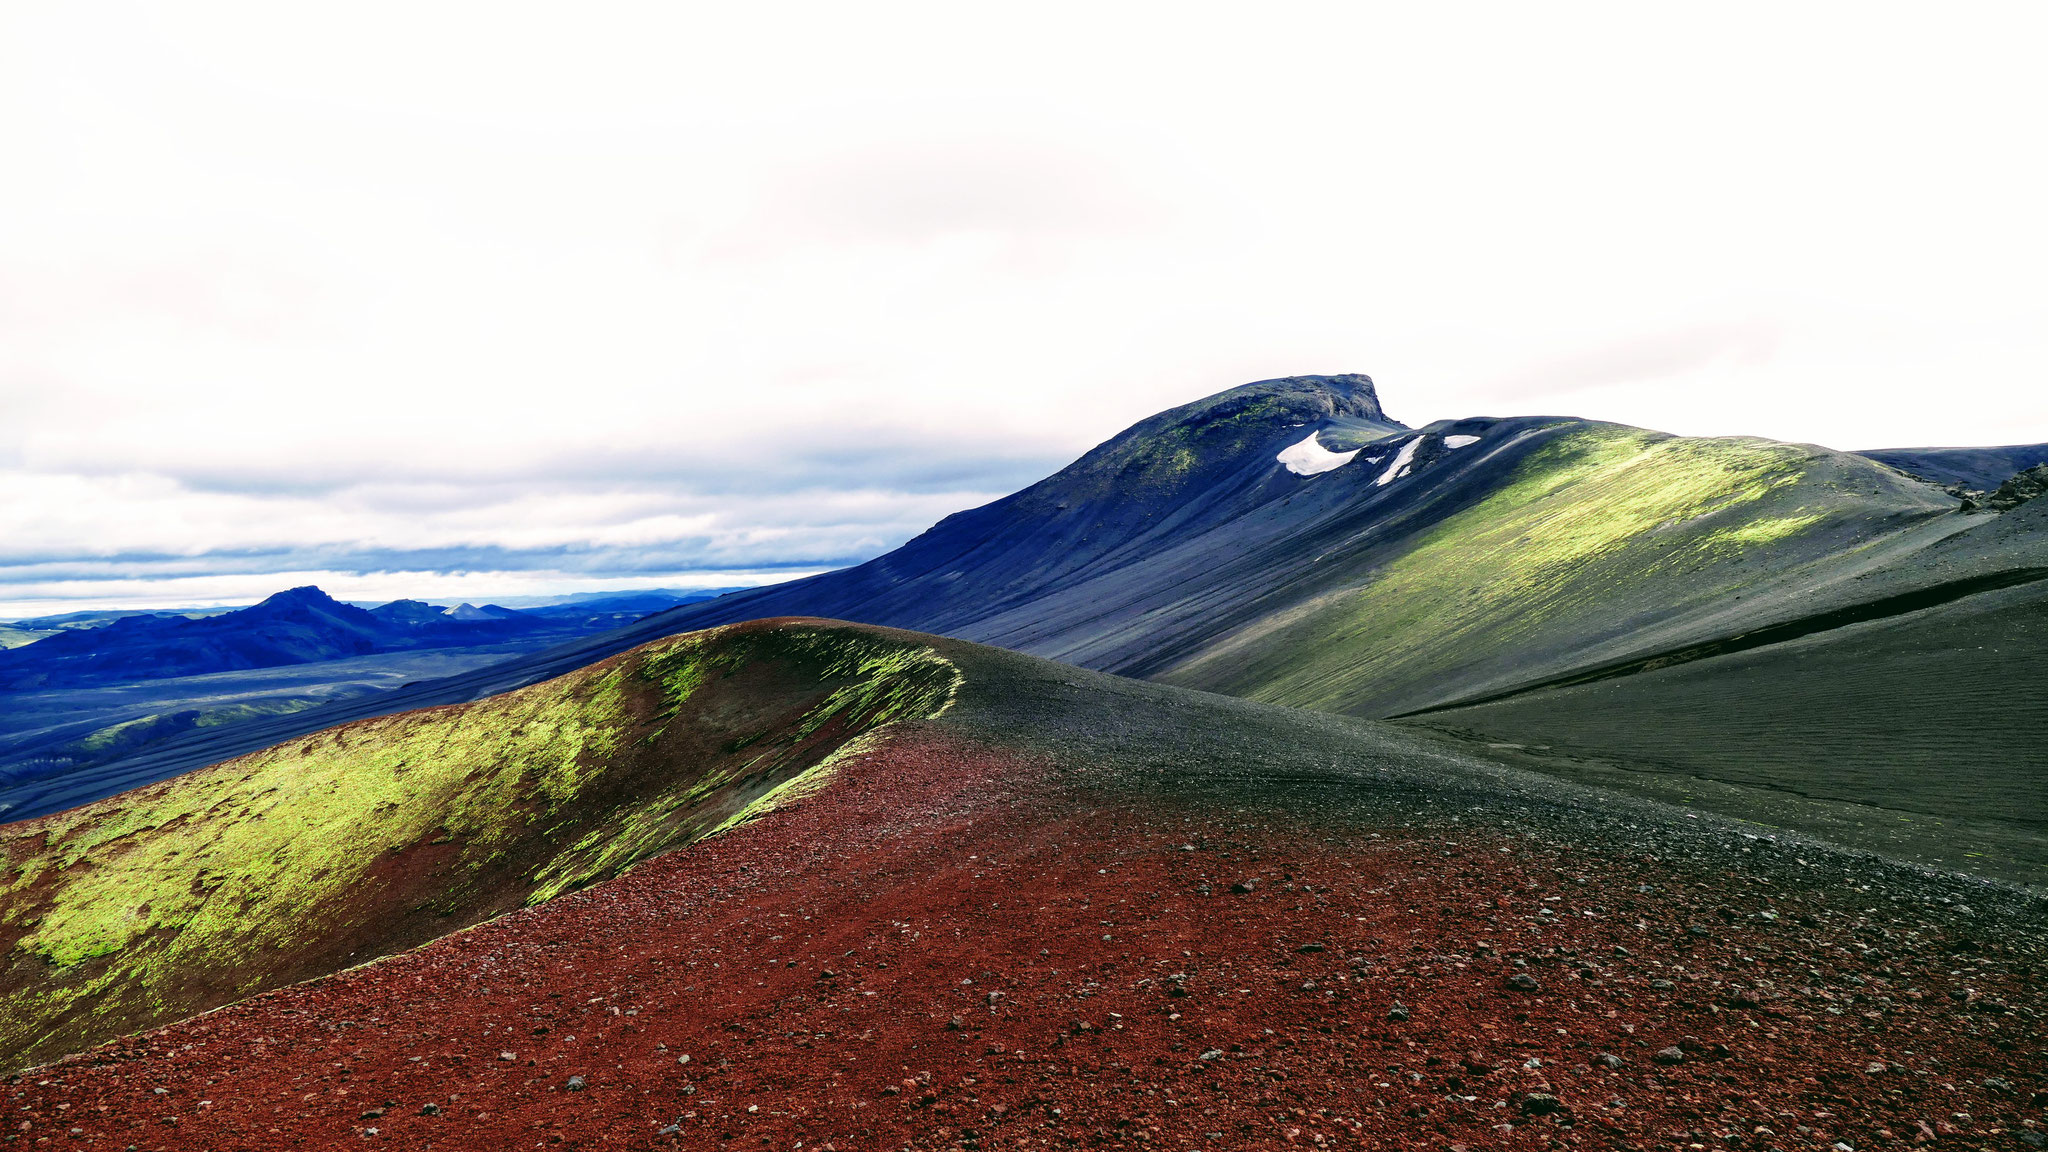 Vulkankrater Raudaskal